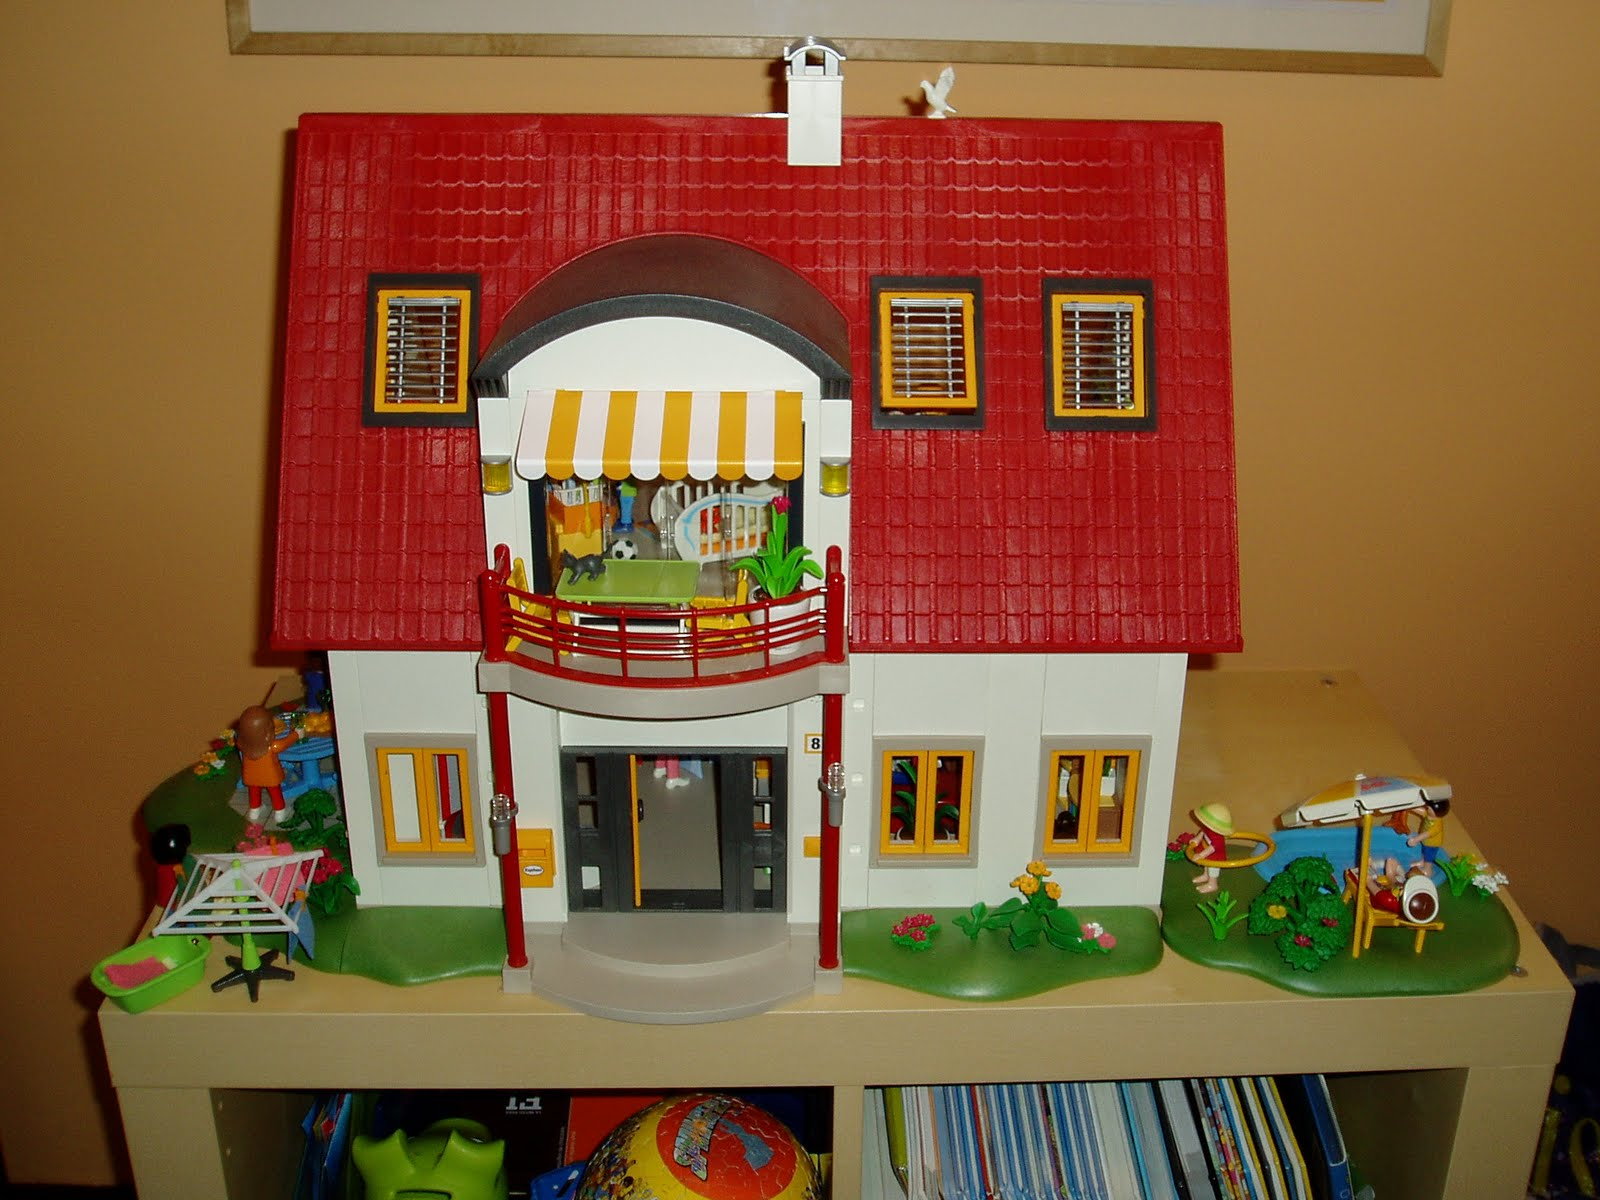 Rodriplay casa moderna al reves de playmobil for Casa moderna playmobil 9266